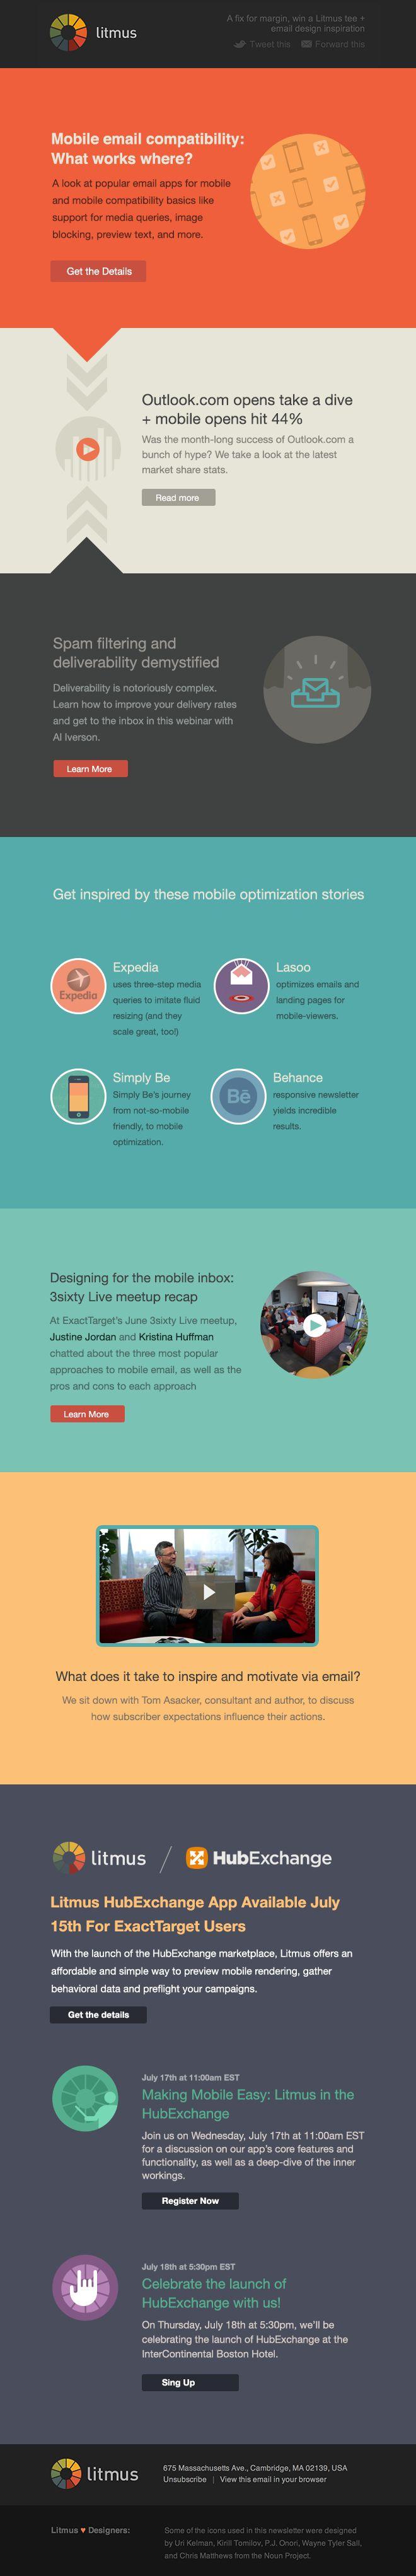 Newsletter Webdesign Pinterest Ui Inspiration And Site Design - Web design newsletter template